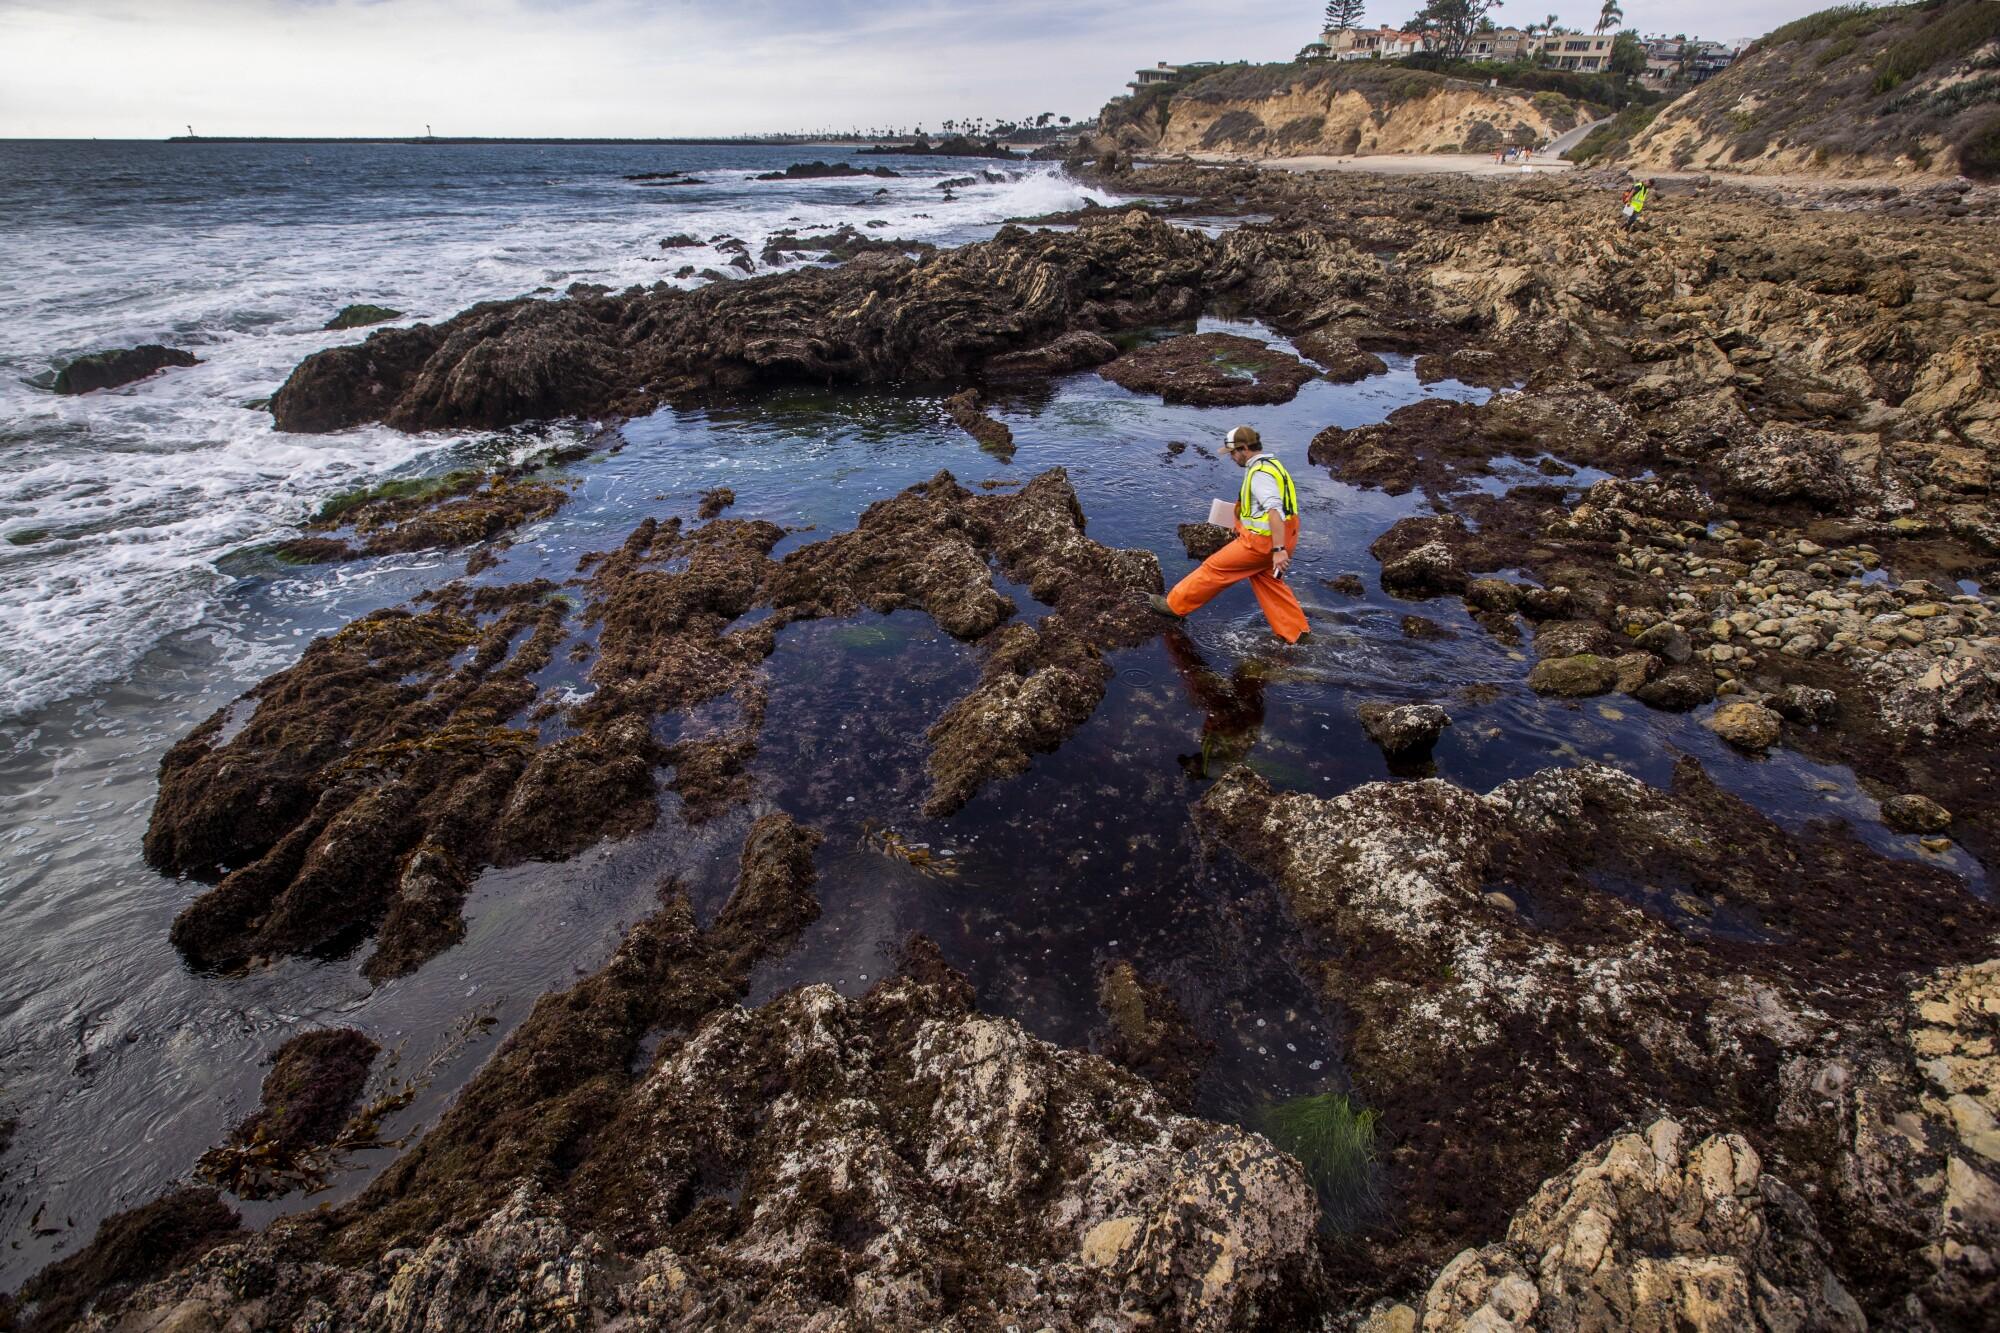 Biologists from  UC Santa Cruz and Tenera Consulting  assess Little Corona del Mar tide pools